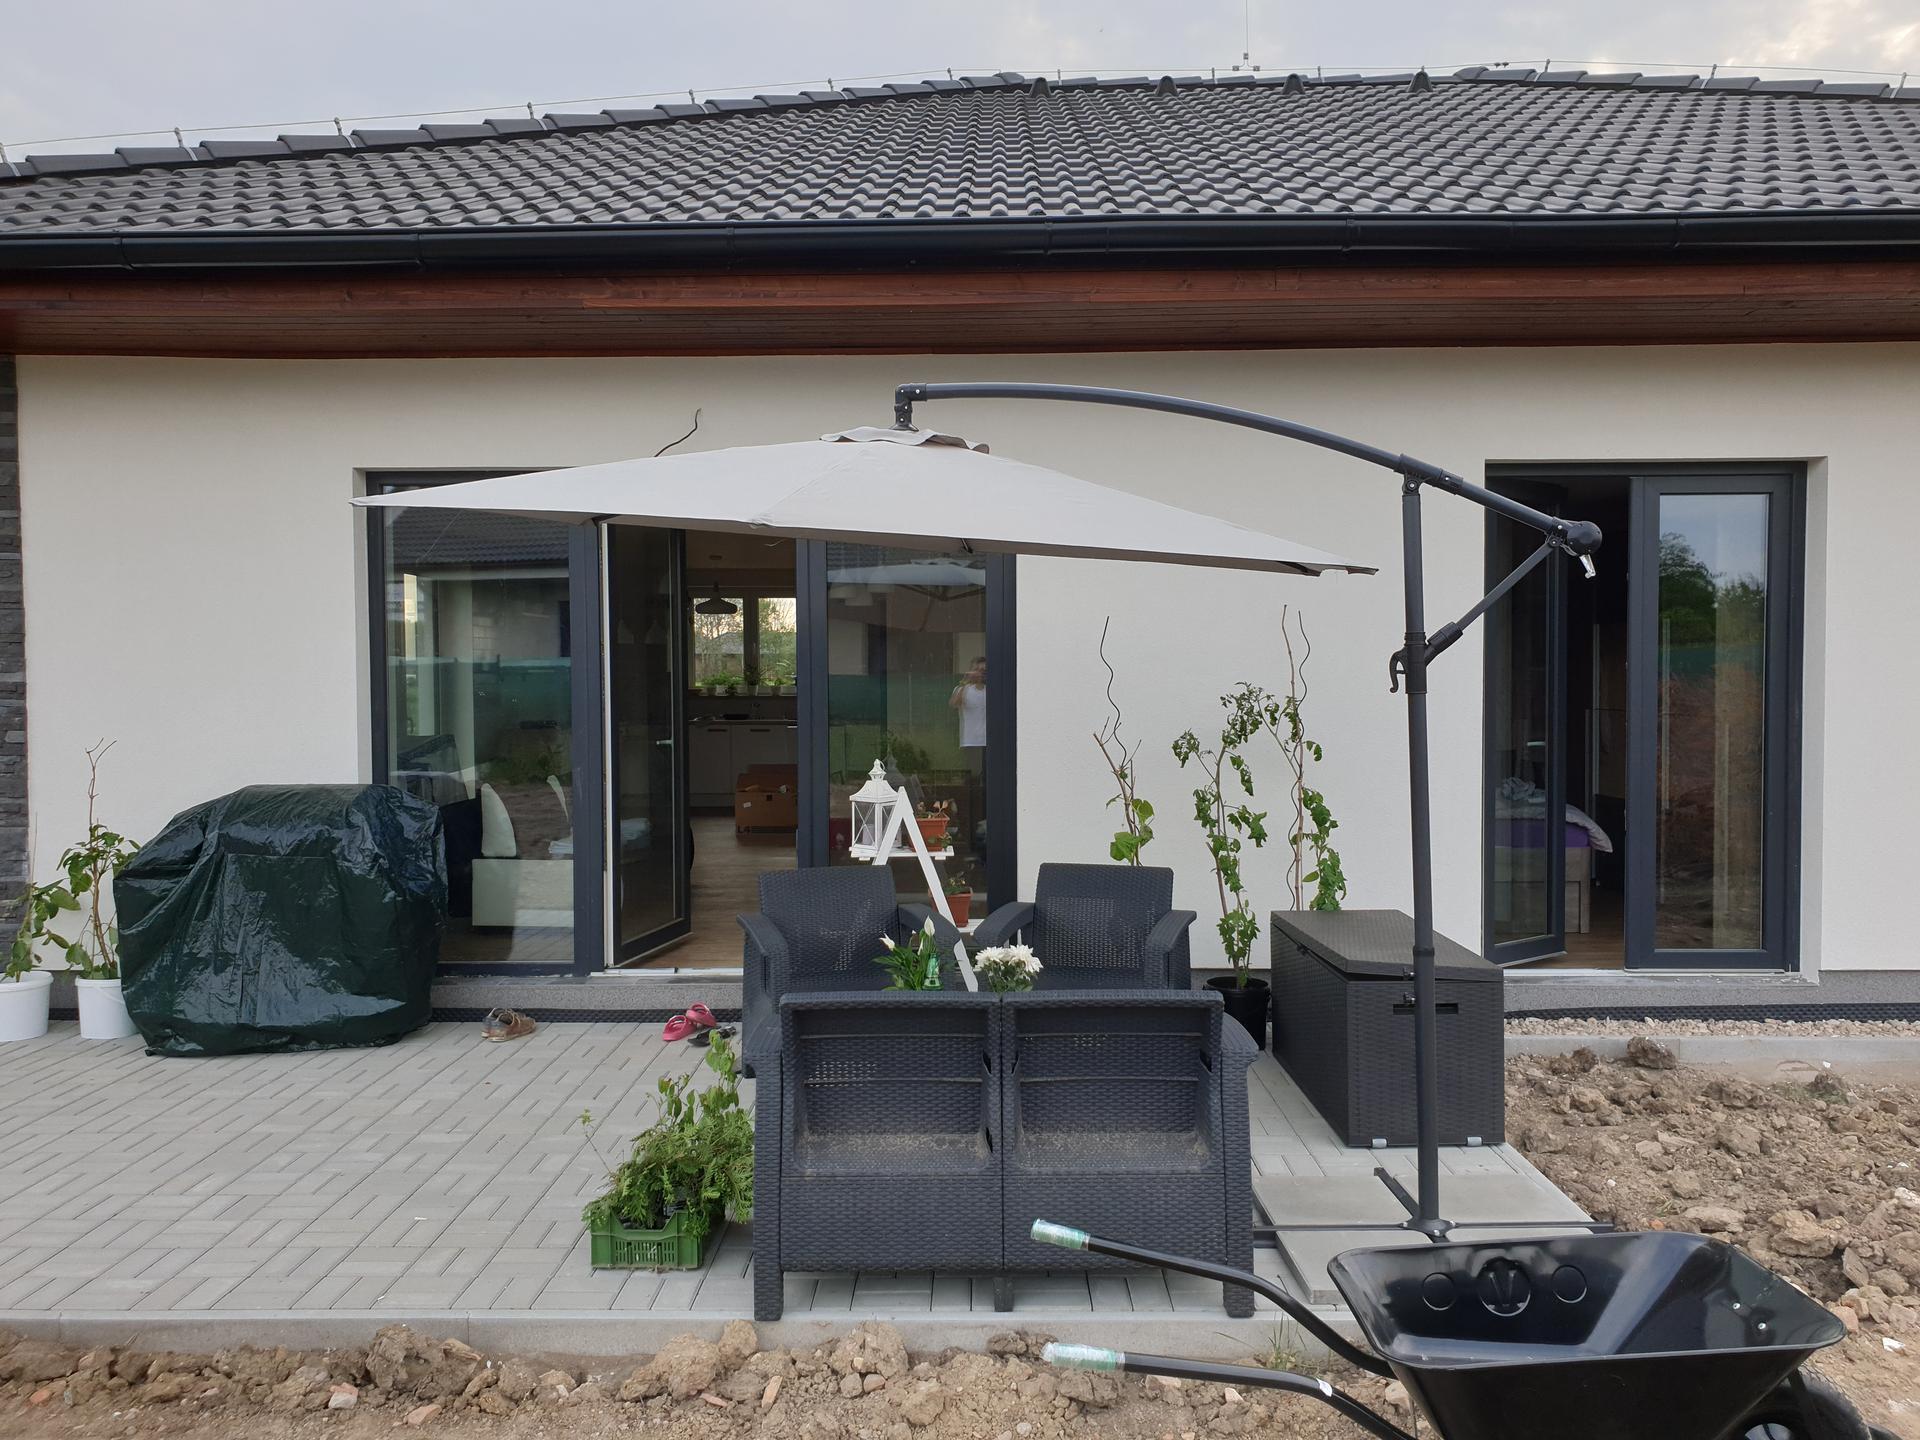 Zahrada a terasa - Obrázek č. 2